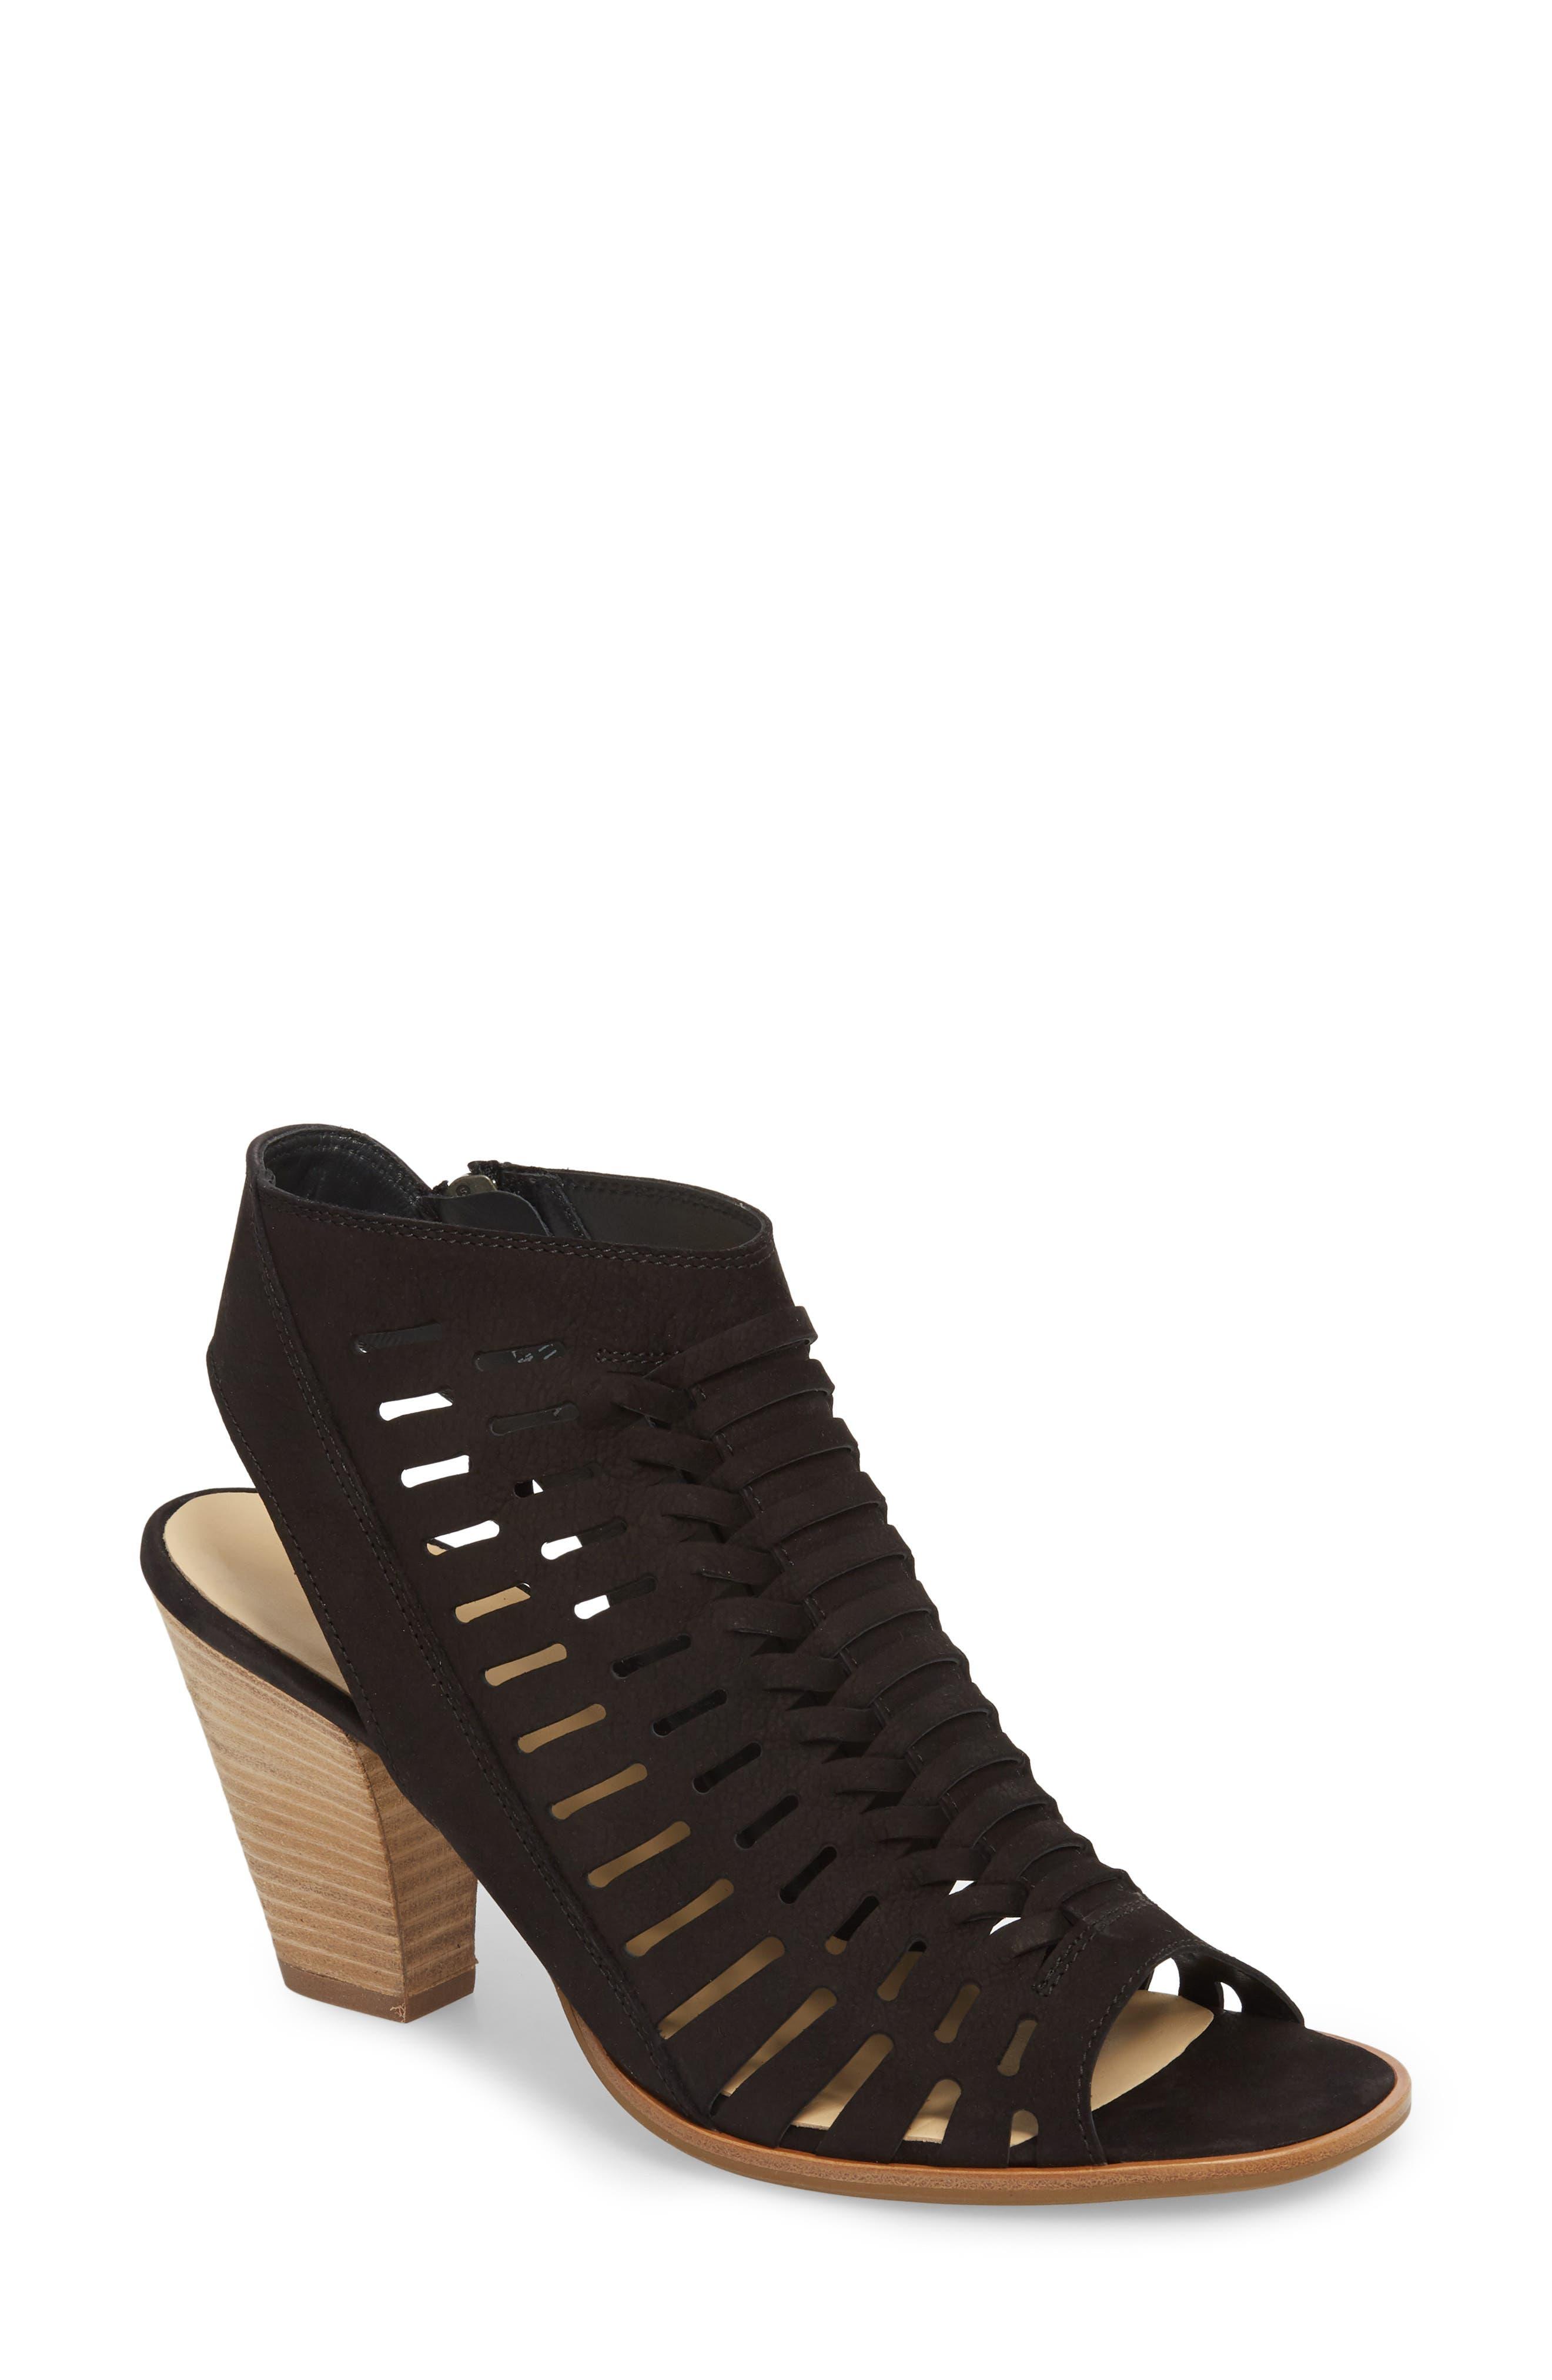 PAUL GREEN Rosa Woven Peep Toe Sandal, Main, color, BLACK NUBUCK